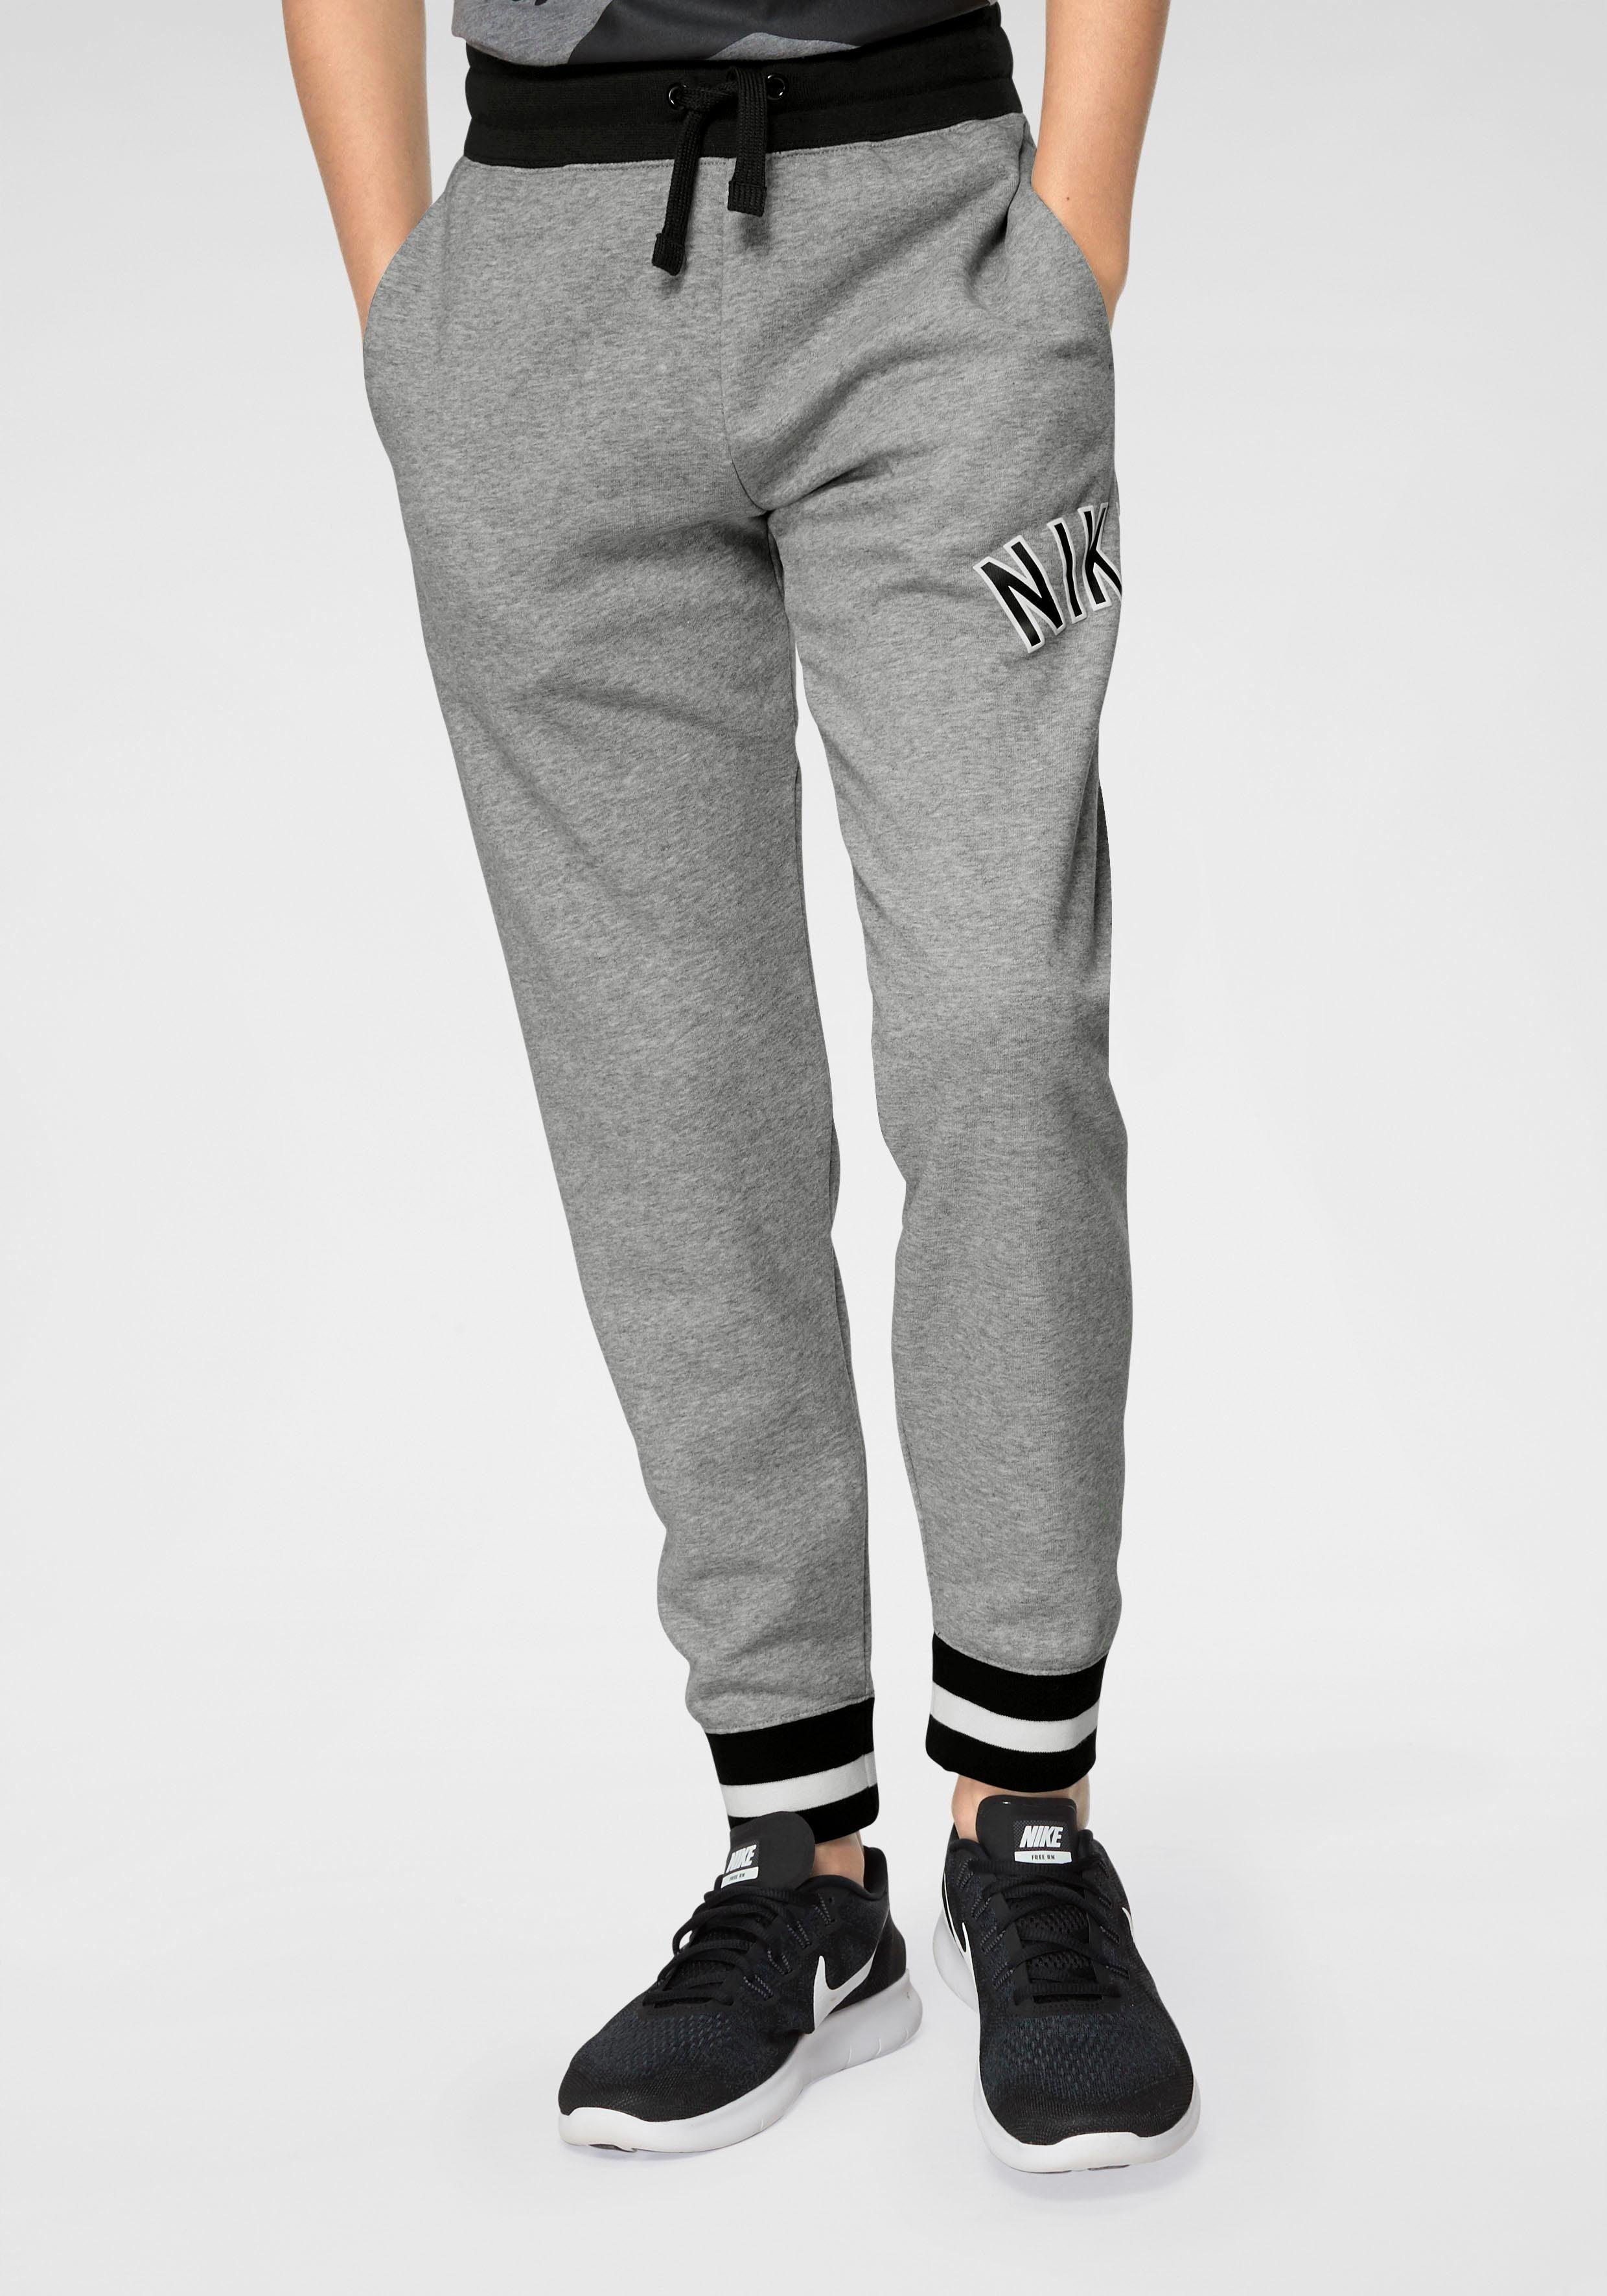 Jogginghose aus sweatware, innen weich angeraut grau Nike